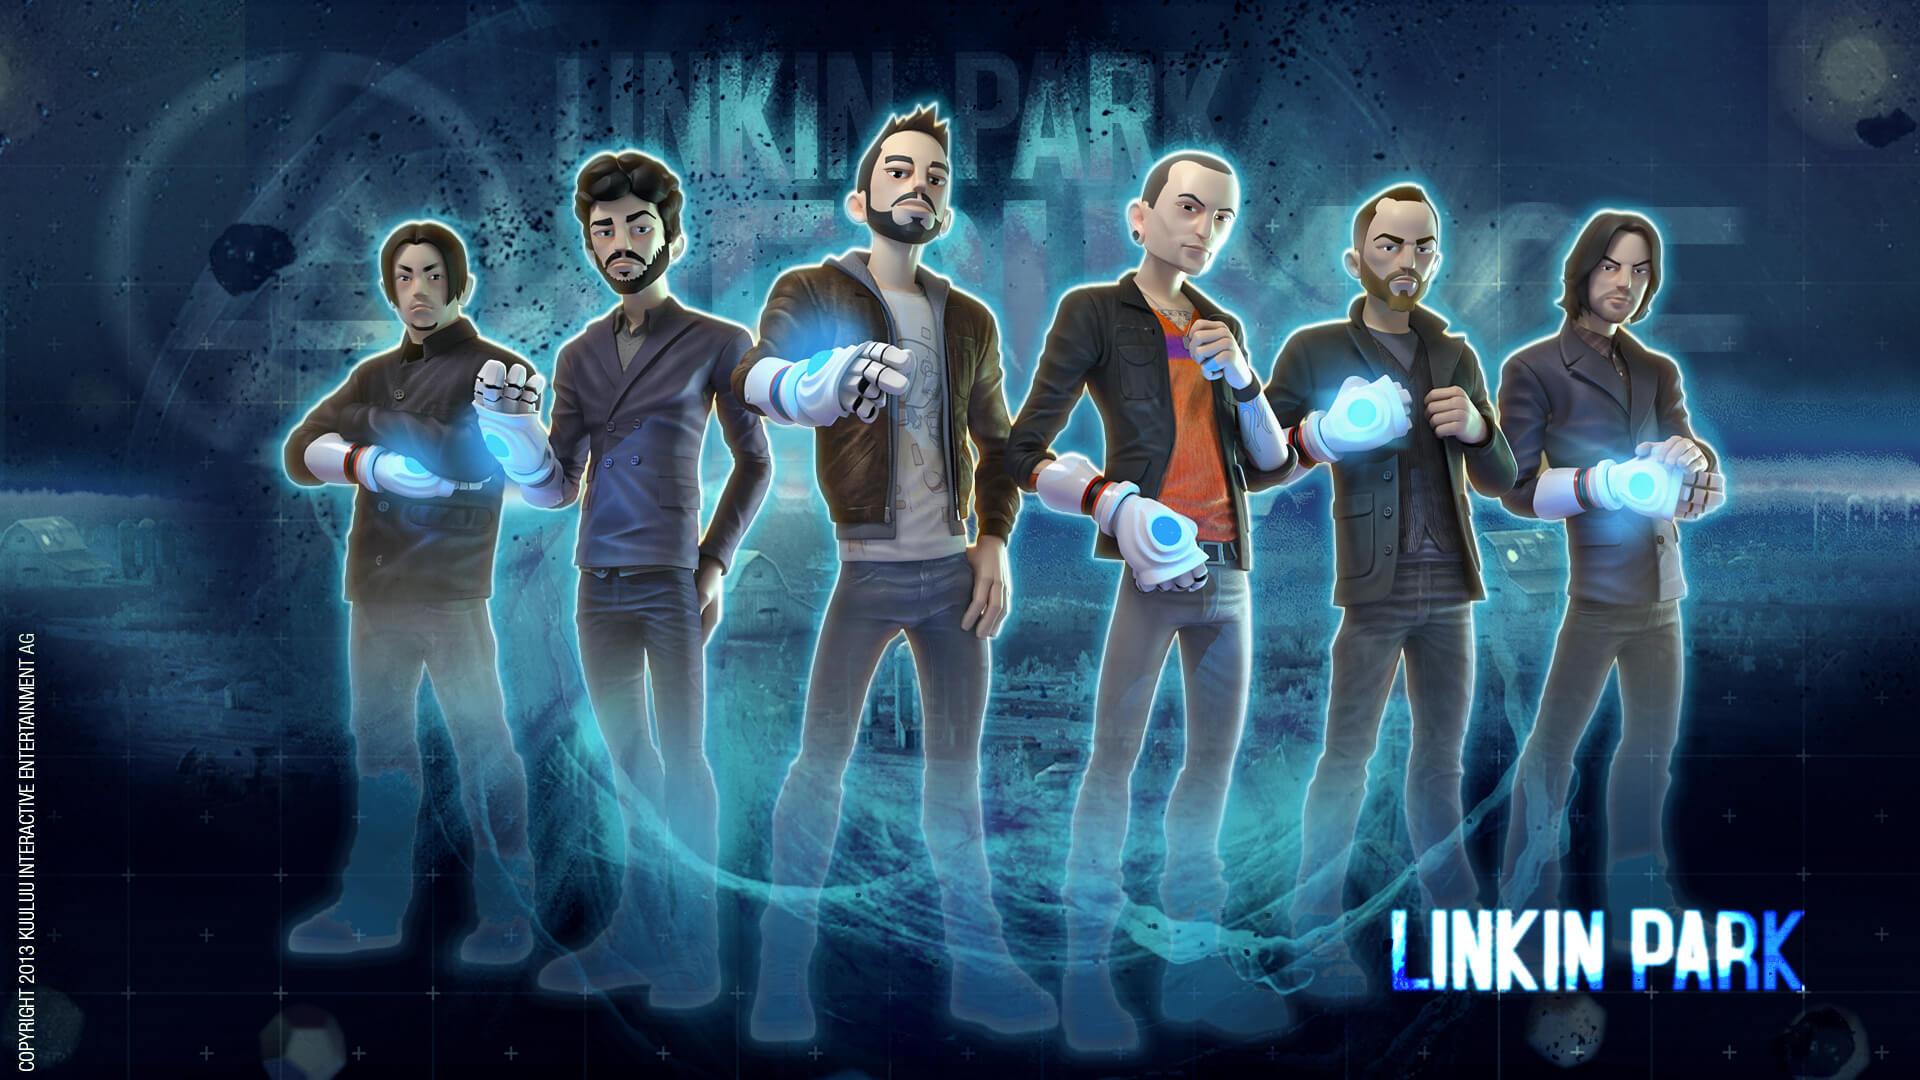 Linkin-Park-game